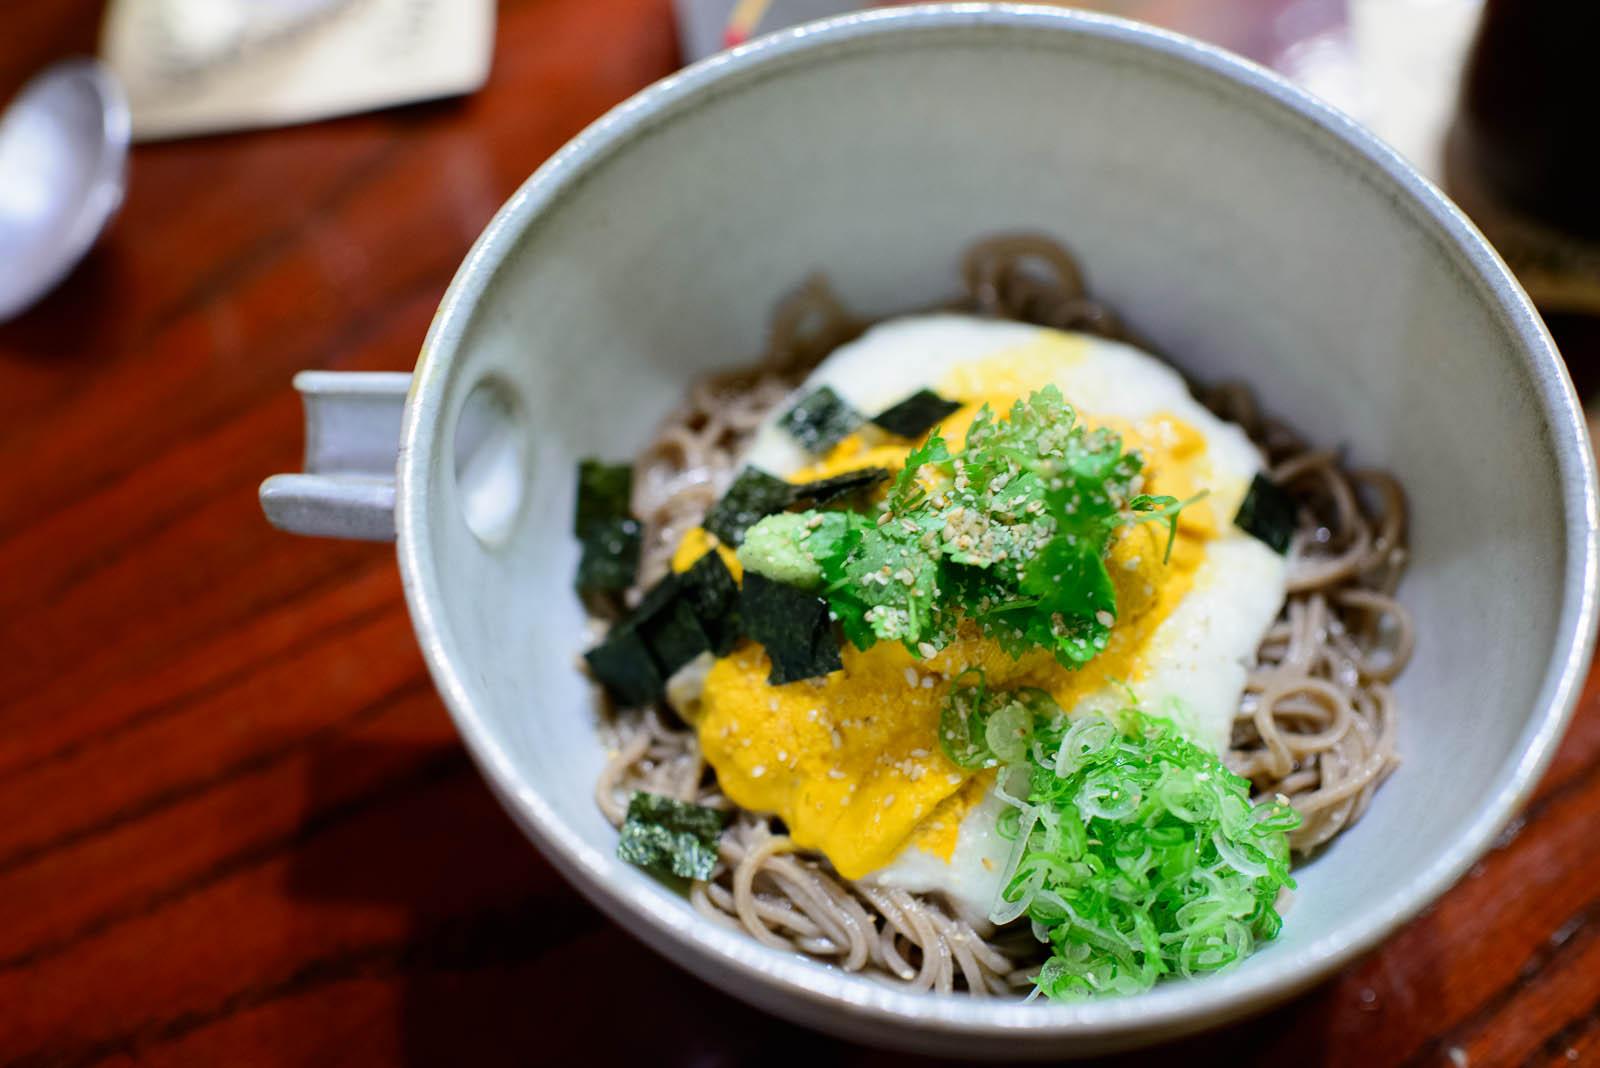 Uni soba - chilled buckwheat noodles with sea urchin sashimi and